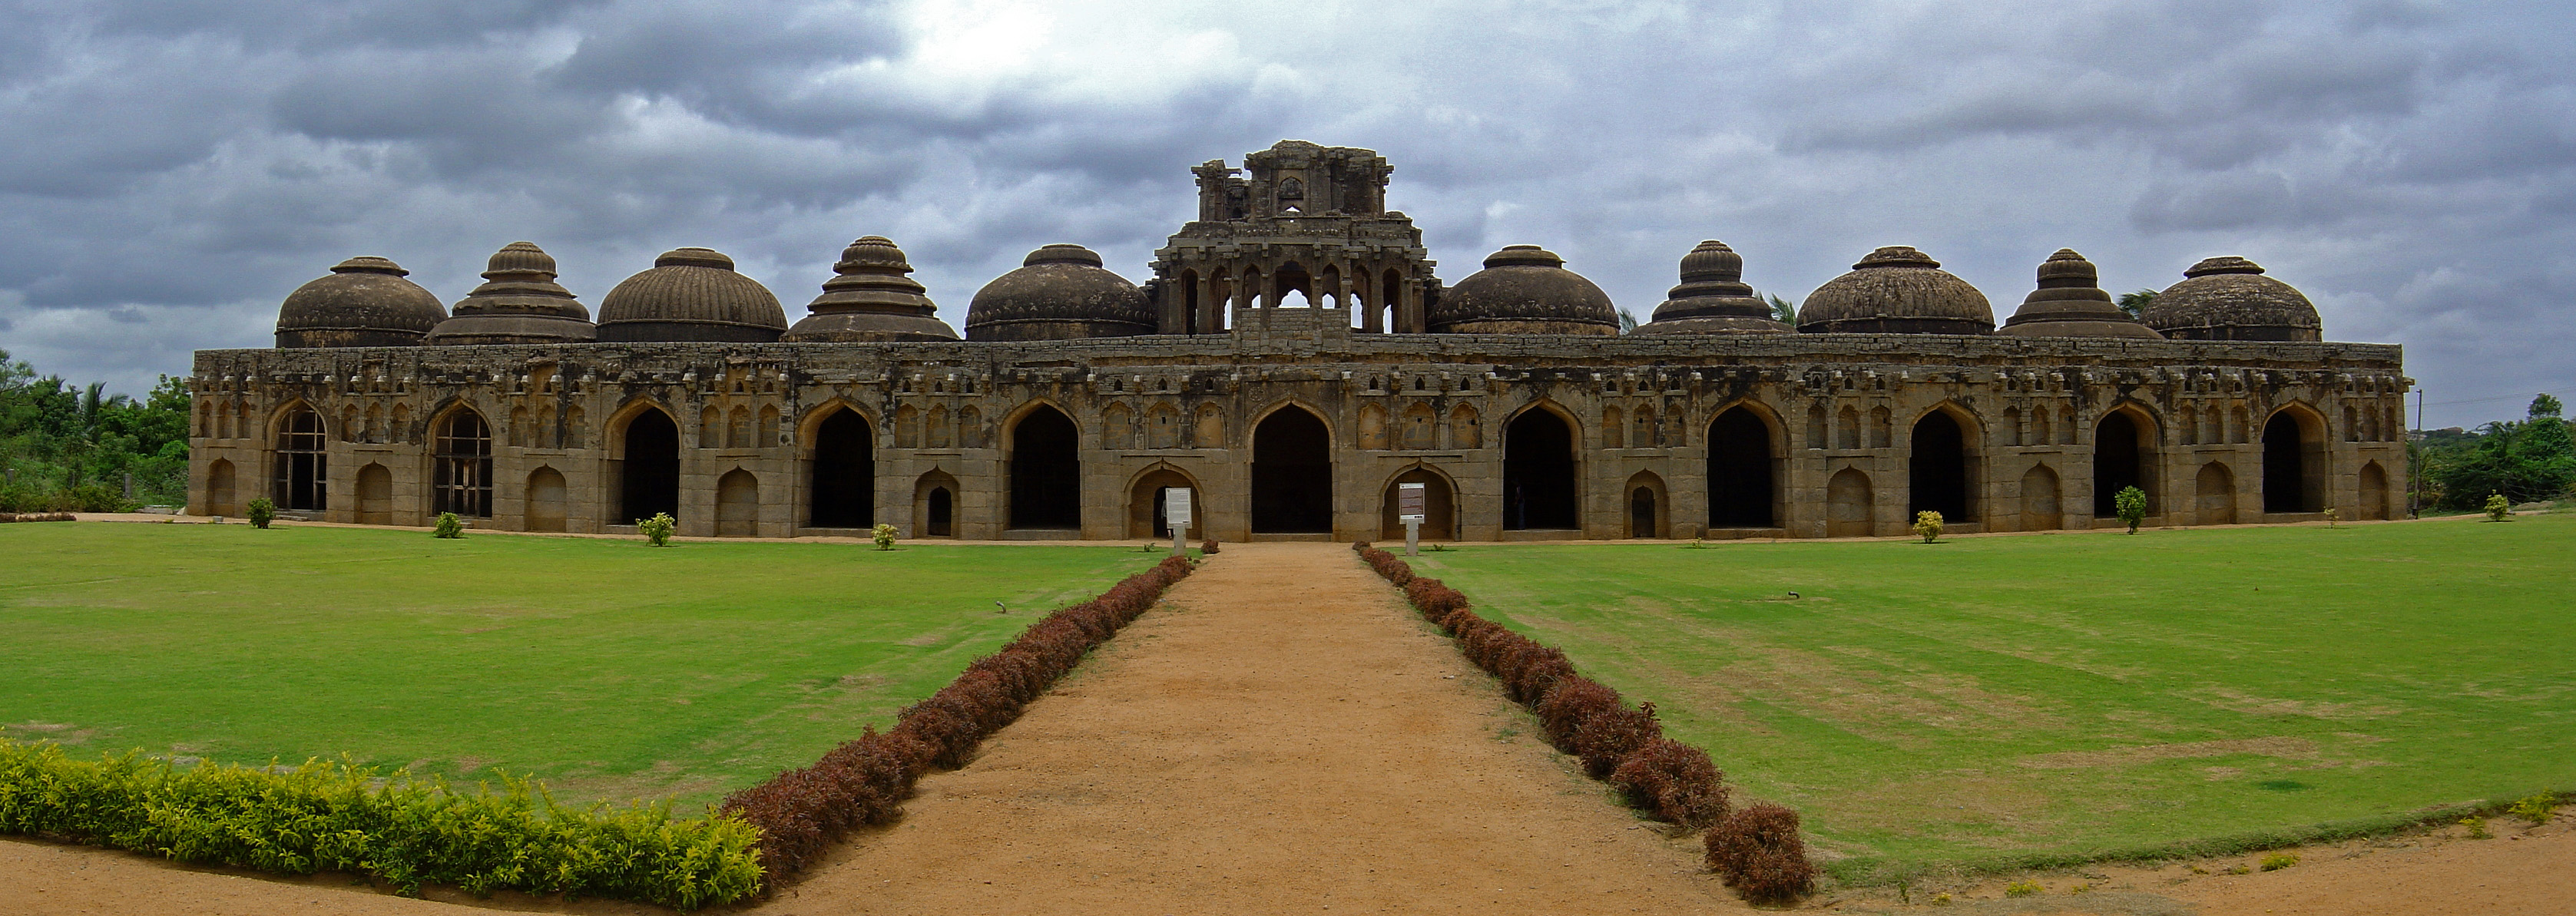 Elephant_stables_Hampi_Karnataka_India